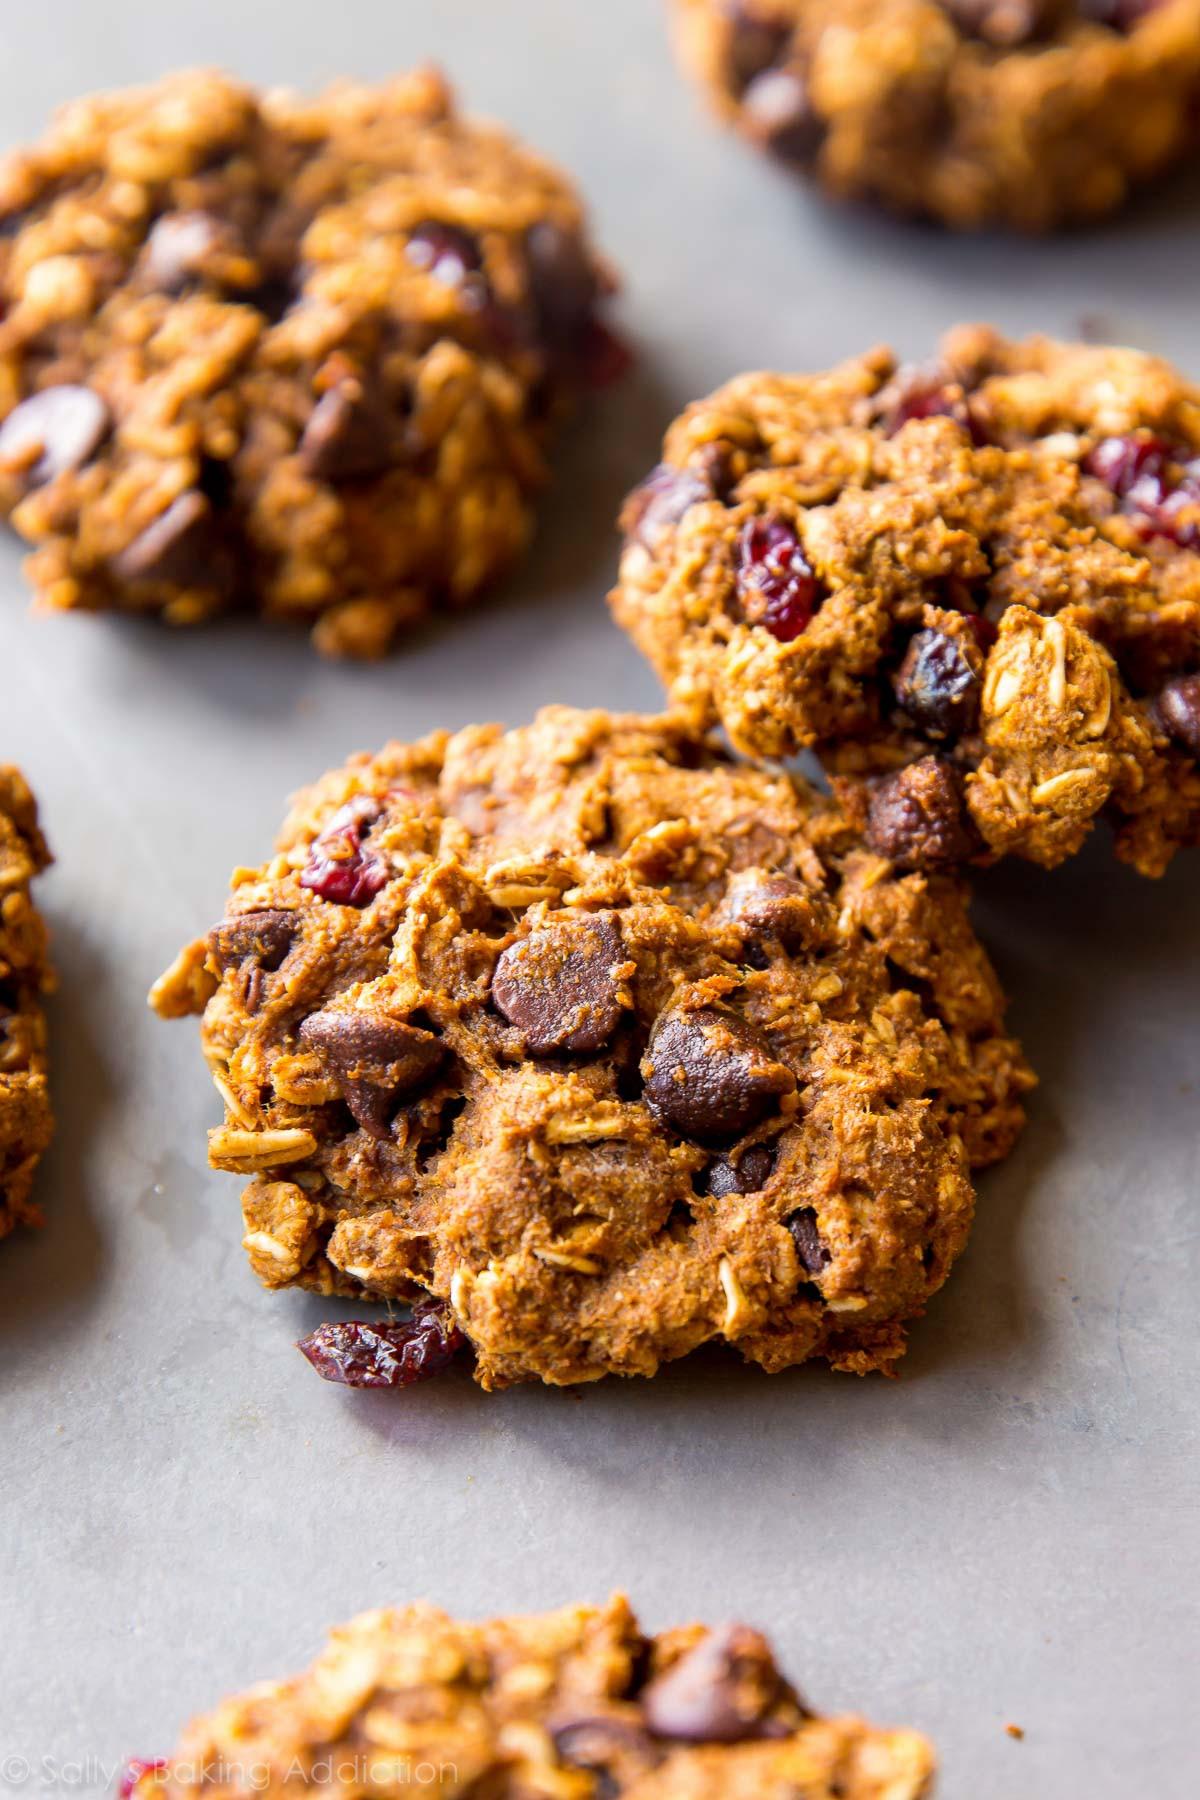 Healthy Oatmeal Chocolate Chip Cookies No Butter  Healthy Pumpkin Chocolate Chip Oatmeal Cookies Sallys